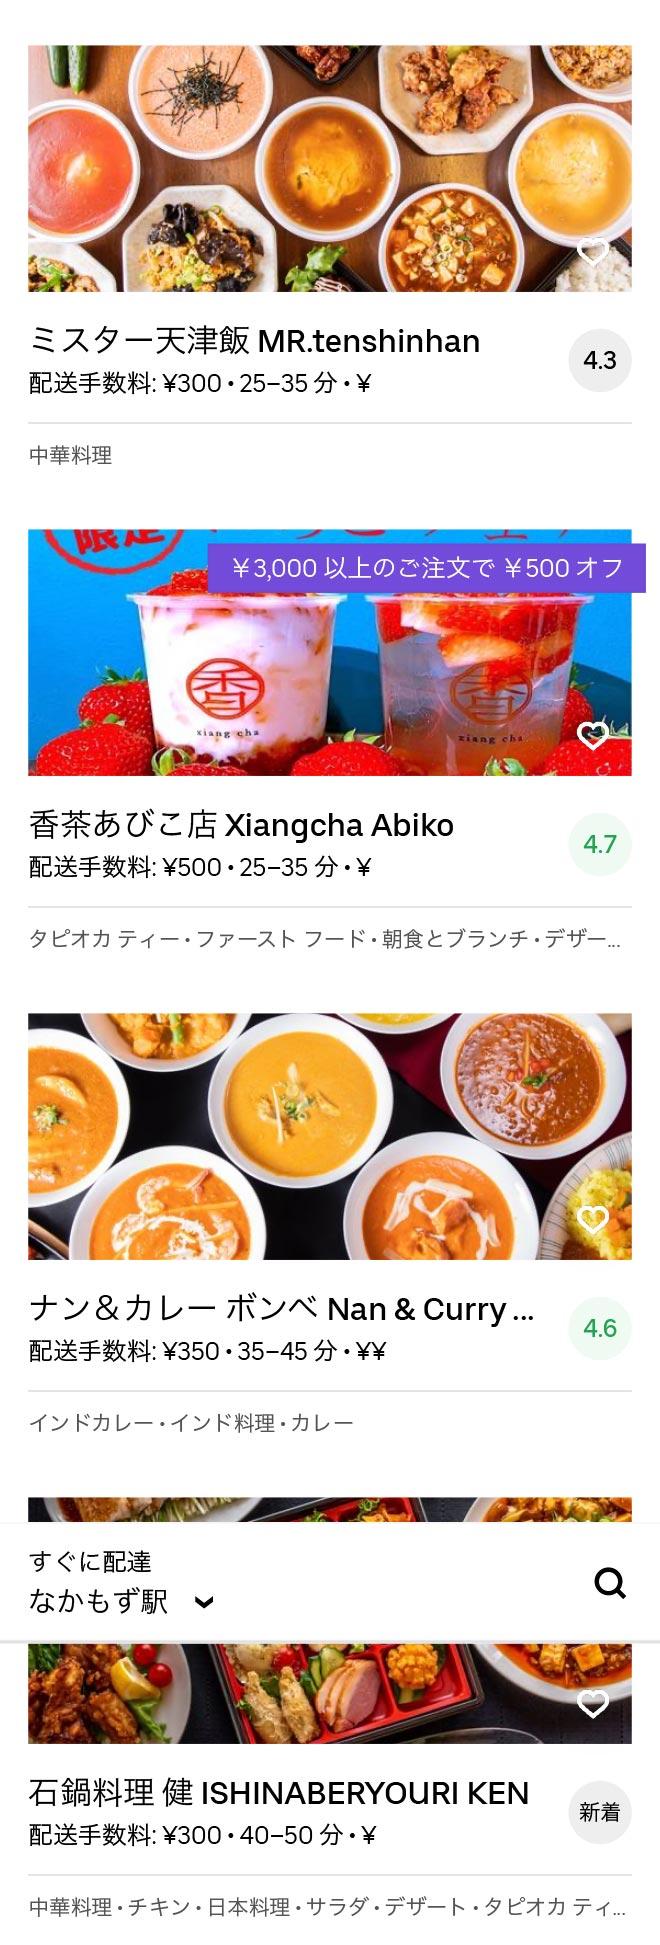 Sakai nakamozu menu 2005 03